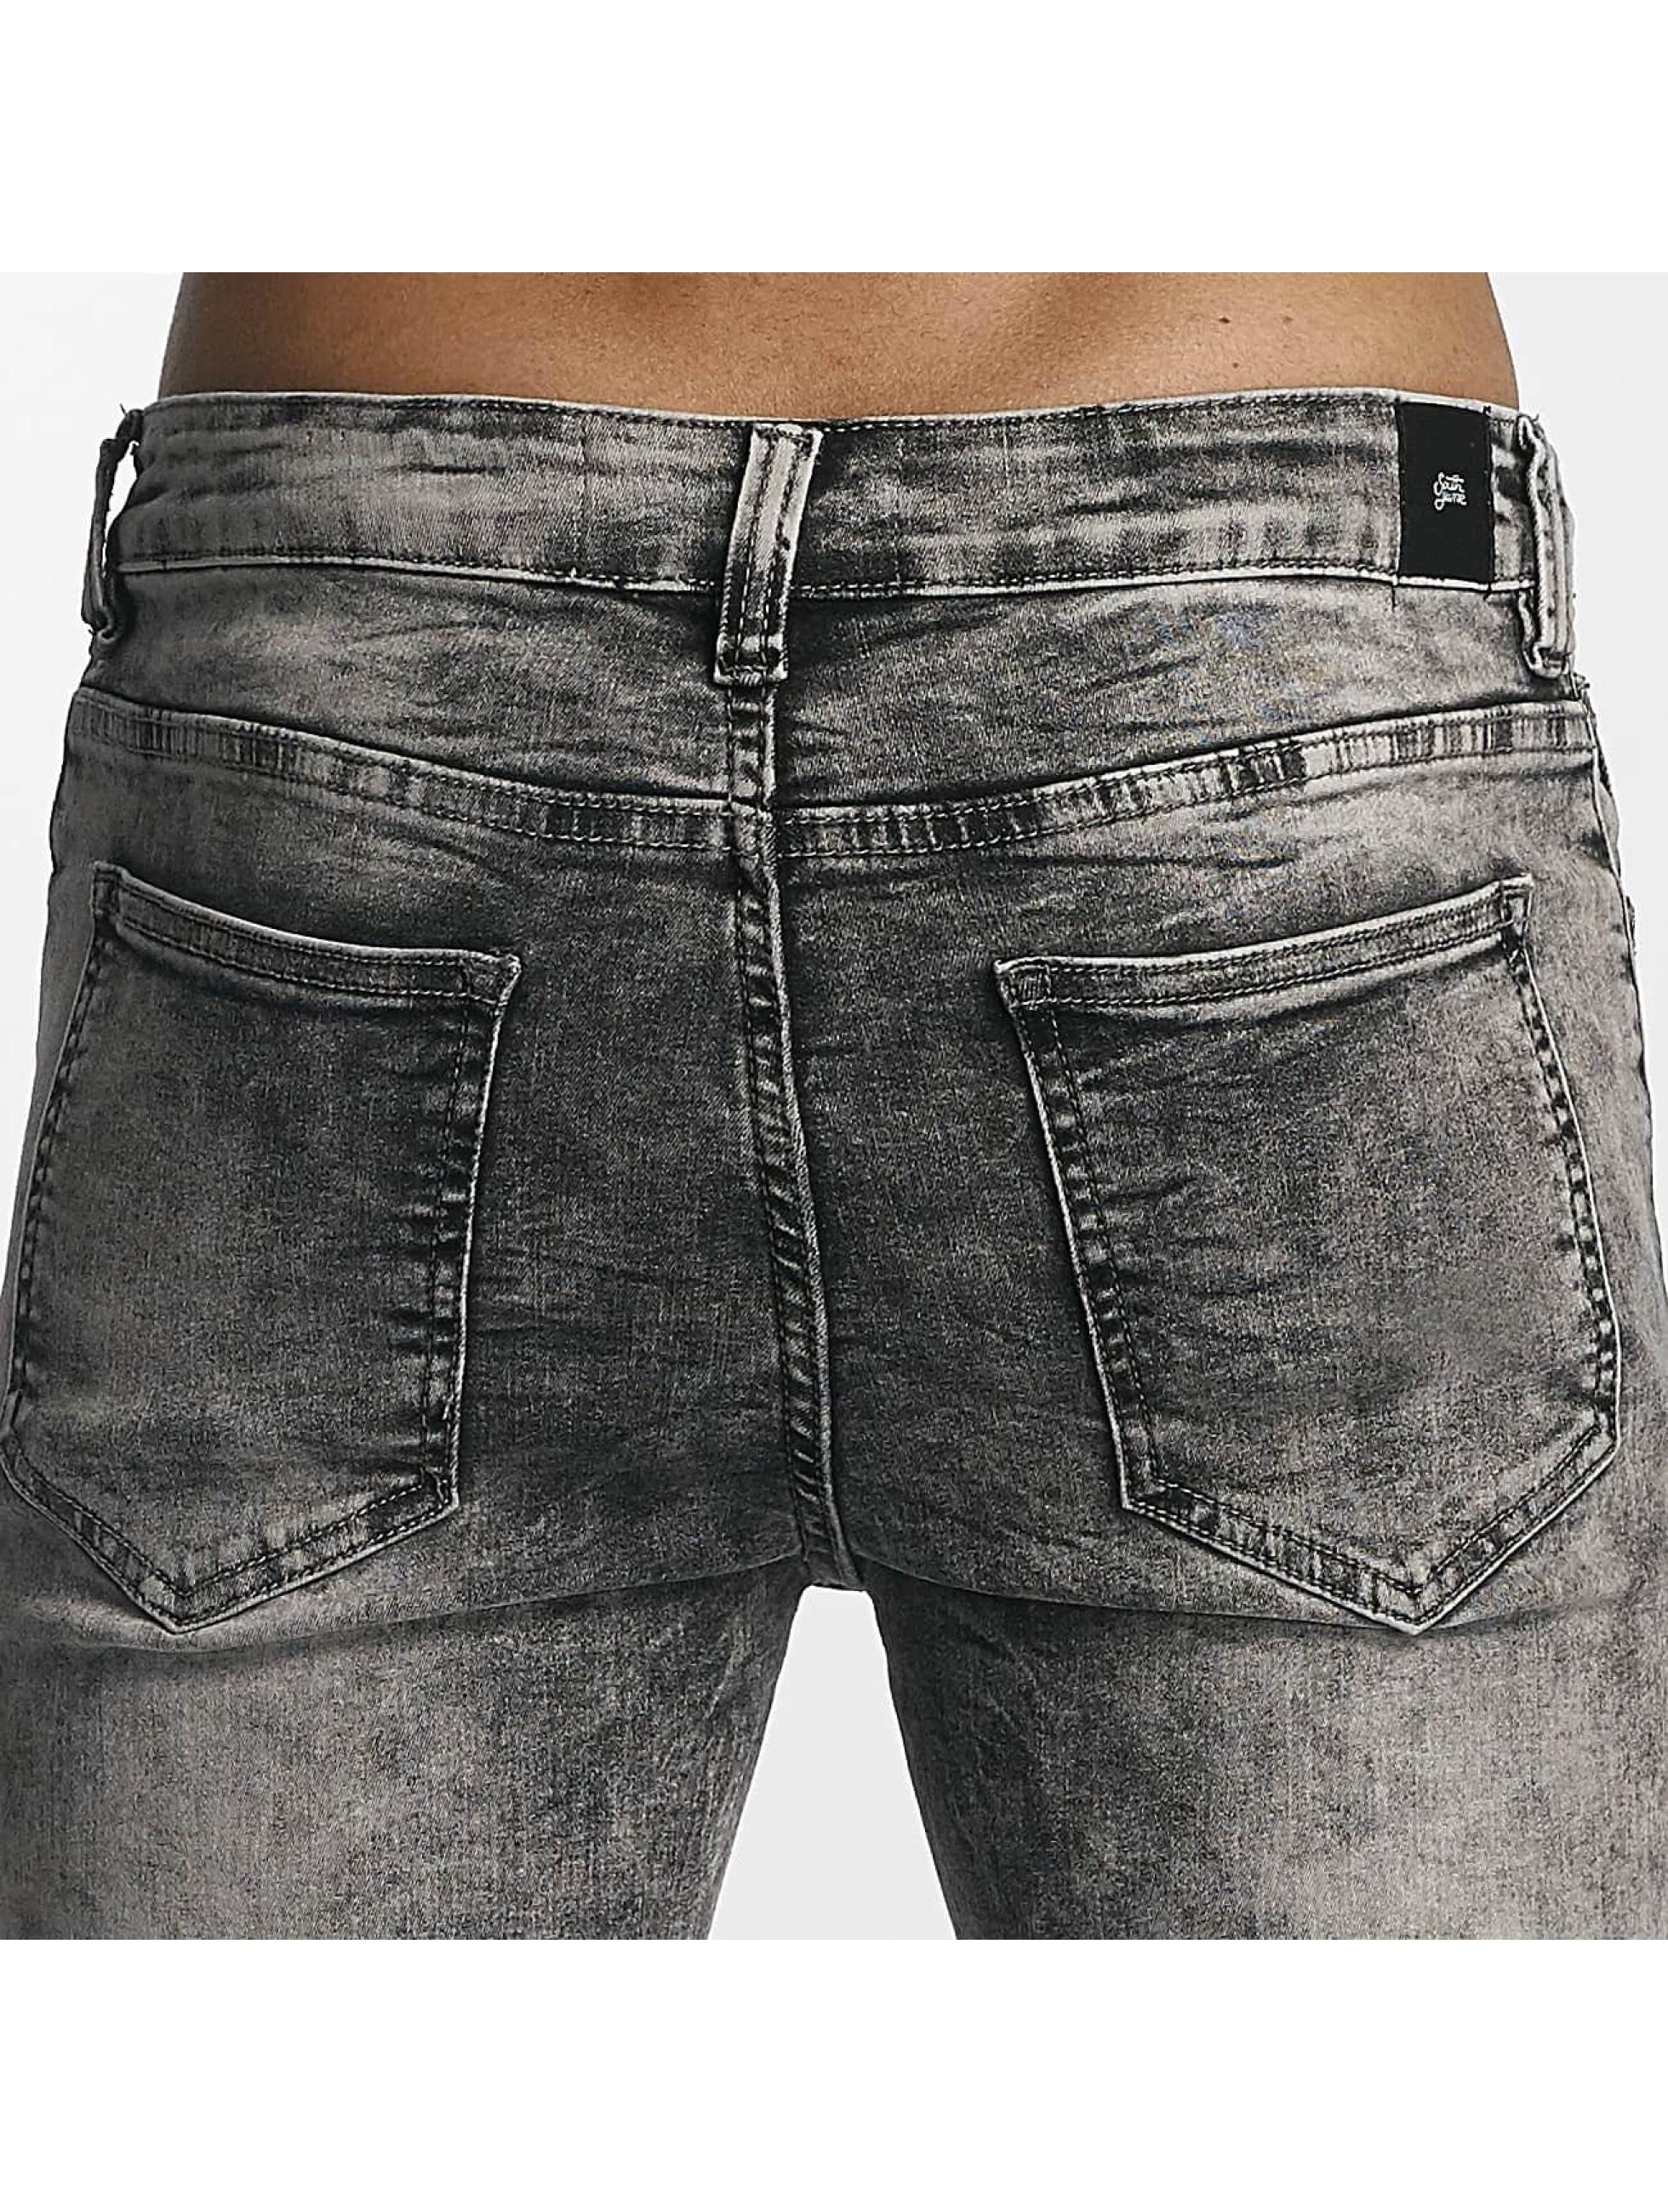 Sixth June Slim Fit Jeans Classic Slimfit grau